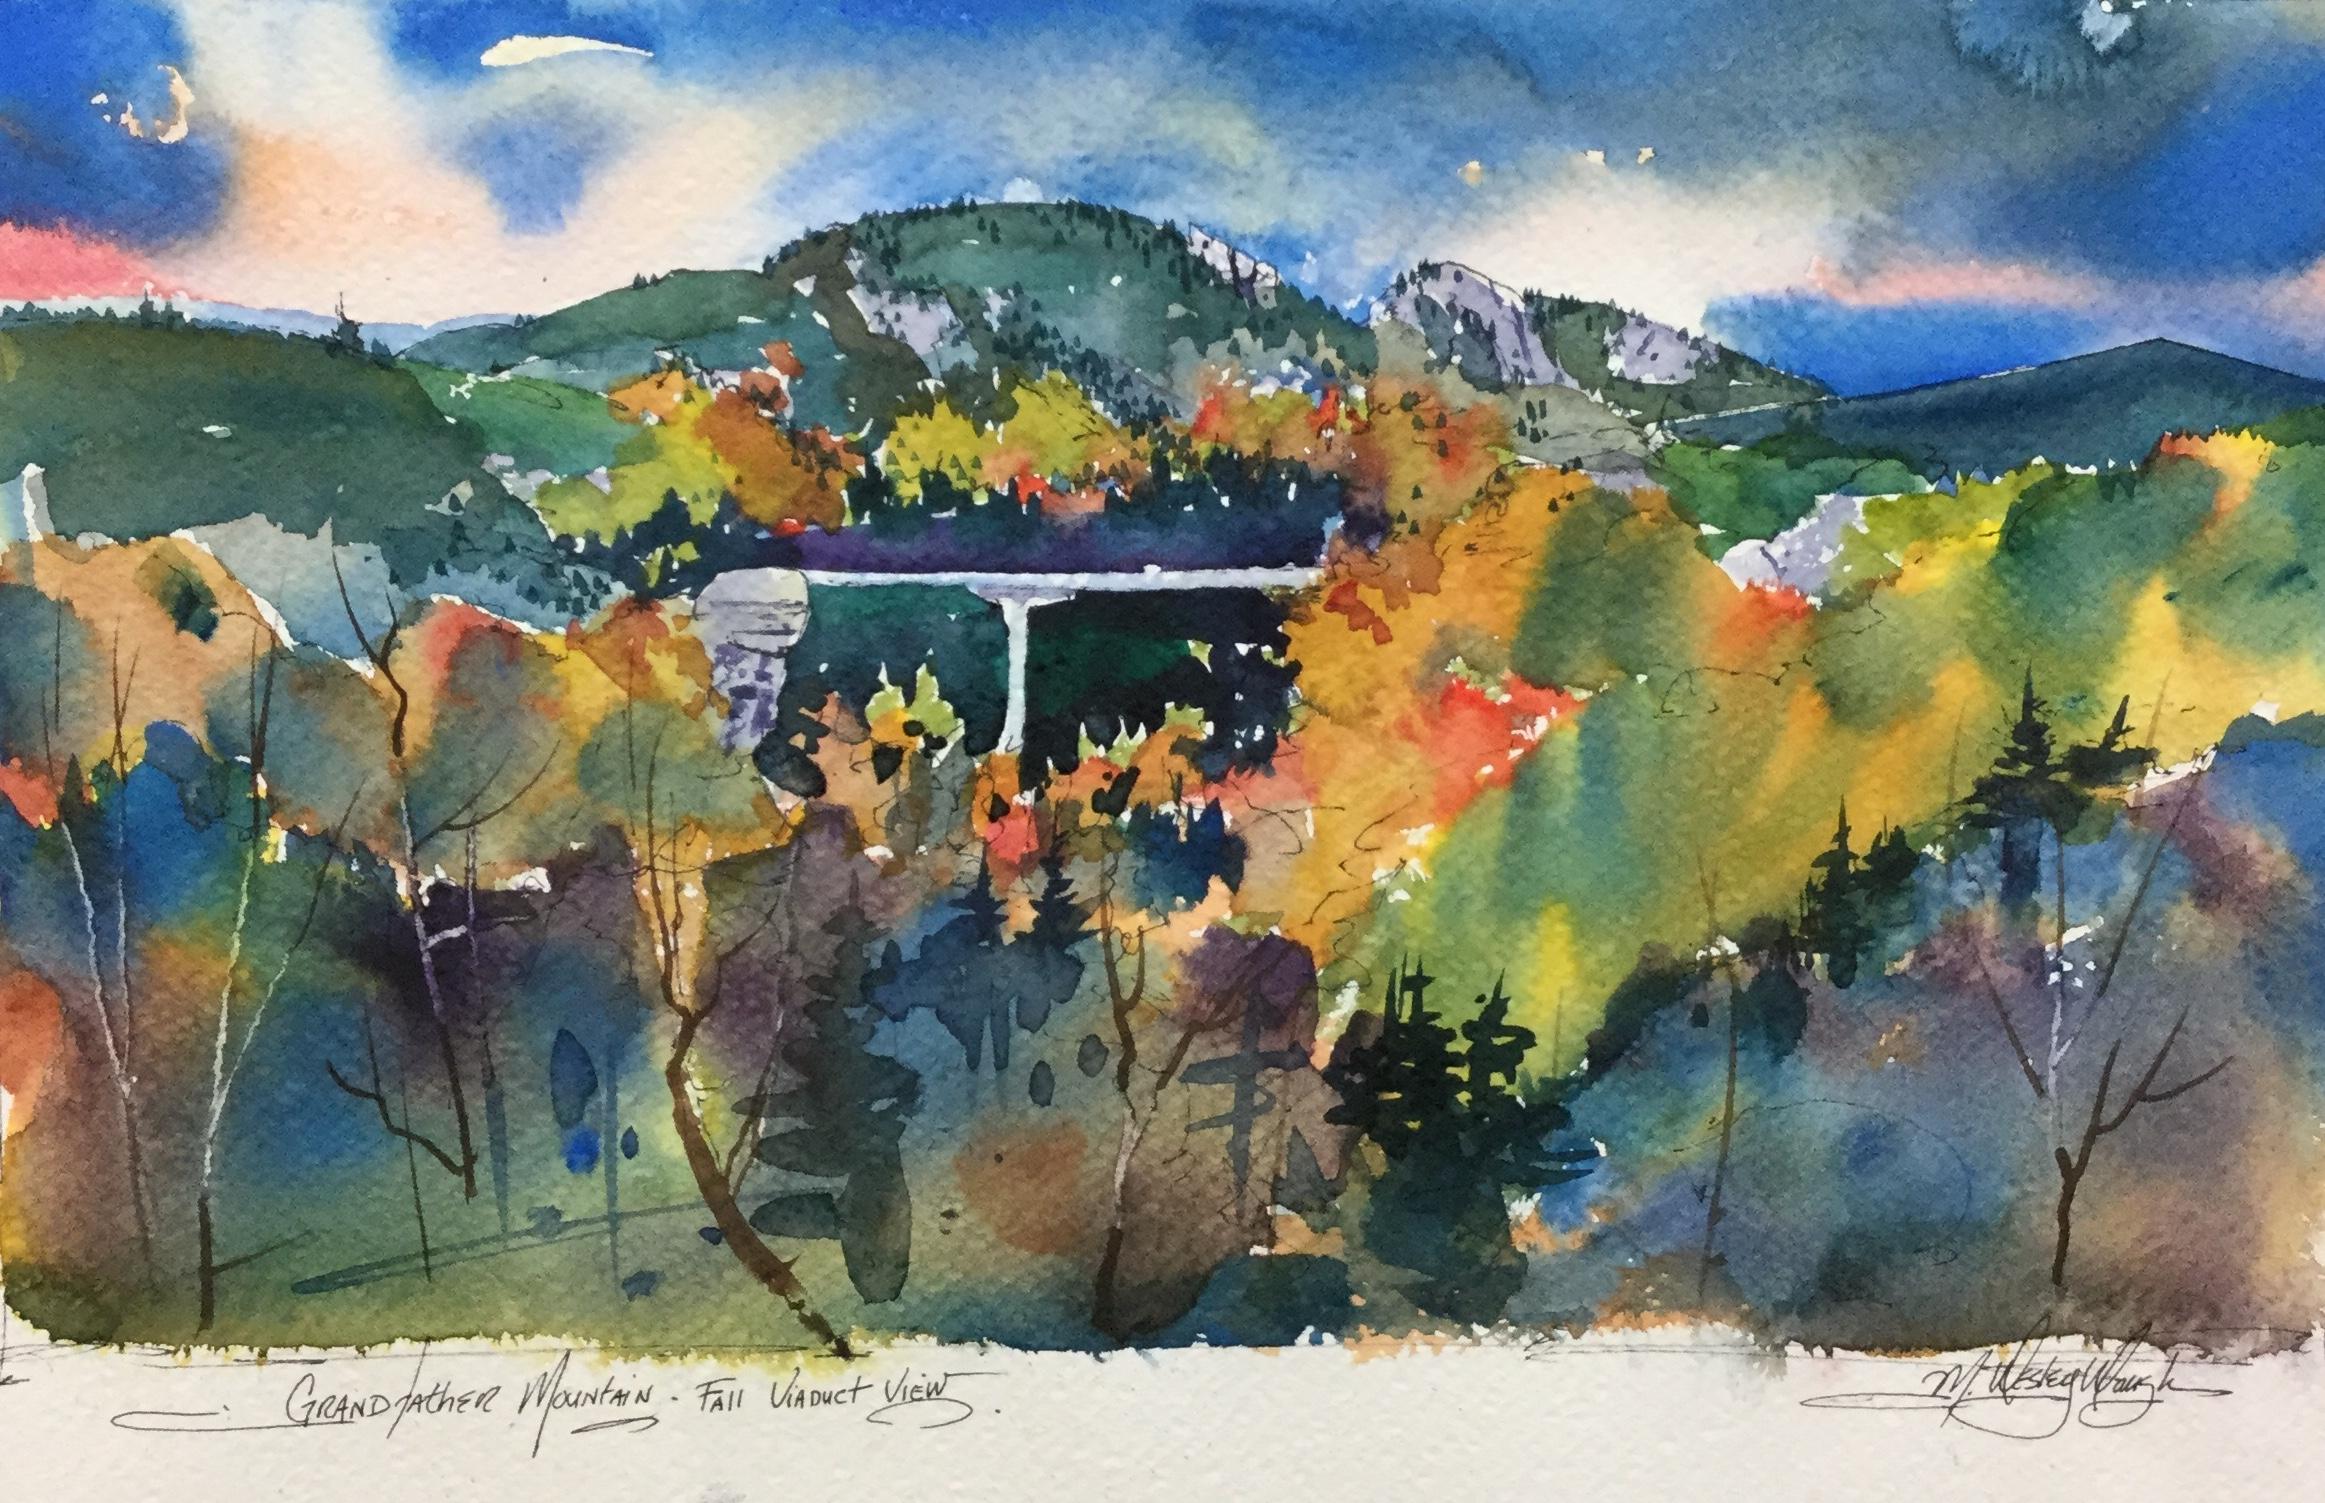 Grandfather Mountain Fall Viaduct View*